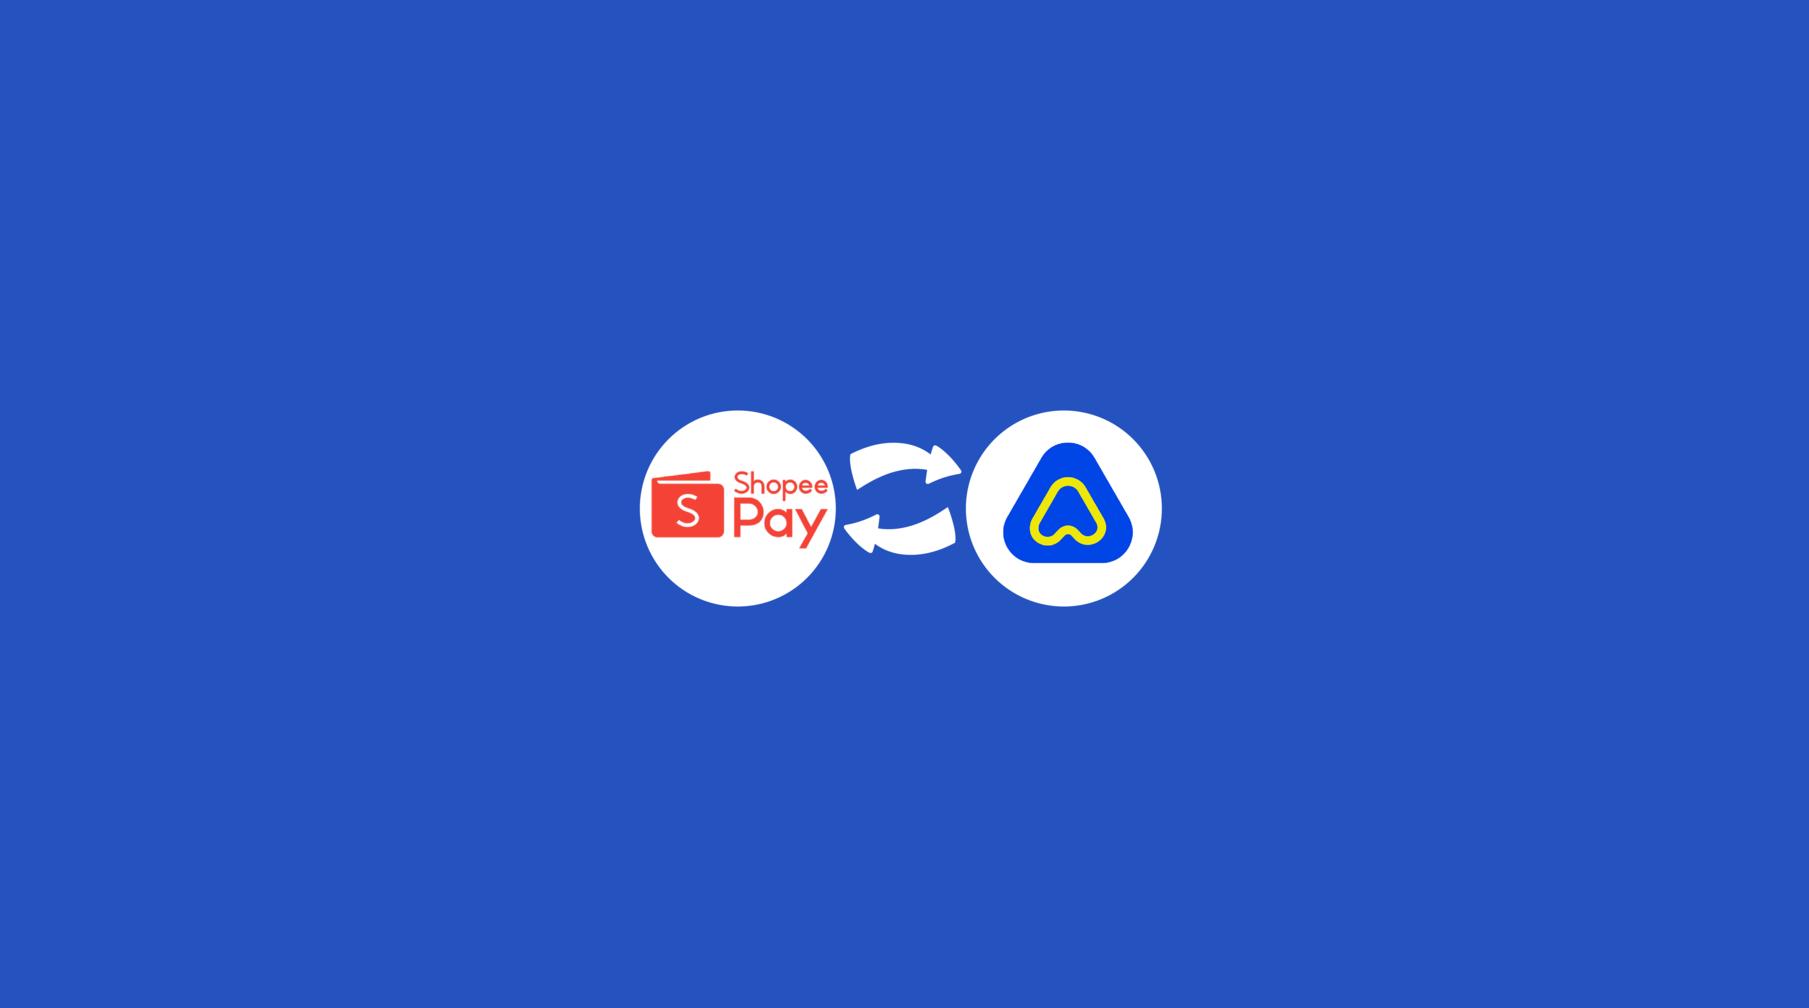 Cara Transfer AstraPay ke ShopeePay atau ShopeePay ke AstraPay